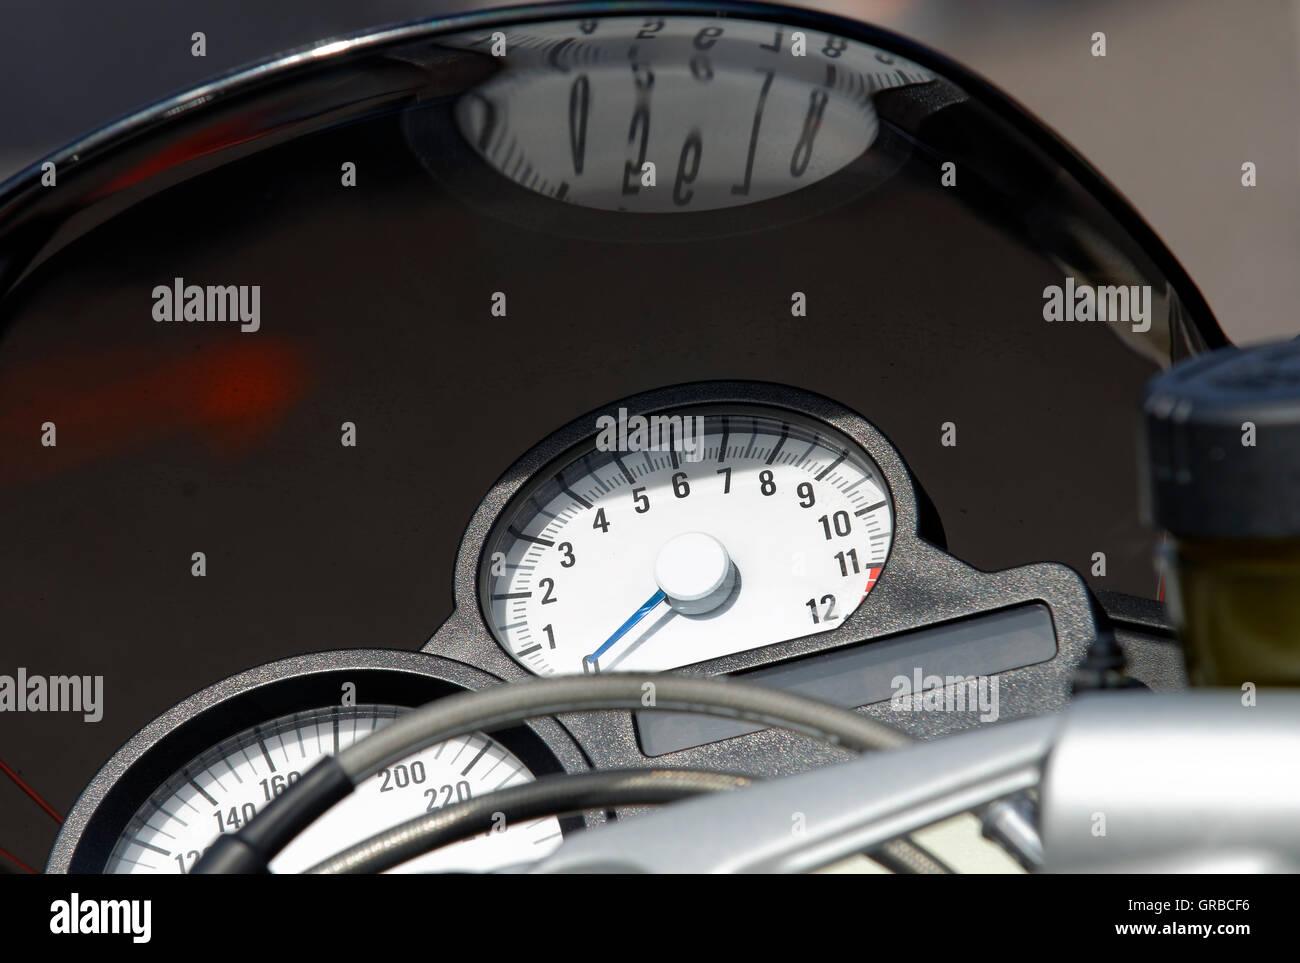 dashboard - Stock Image